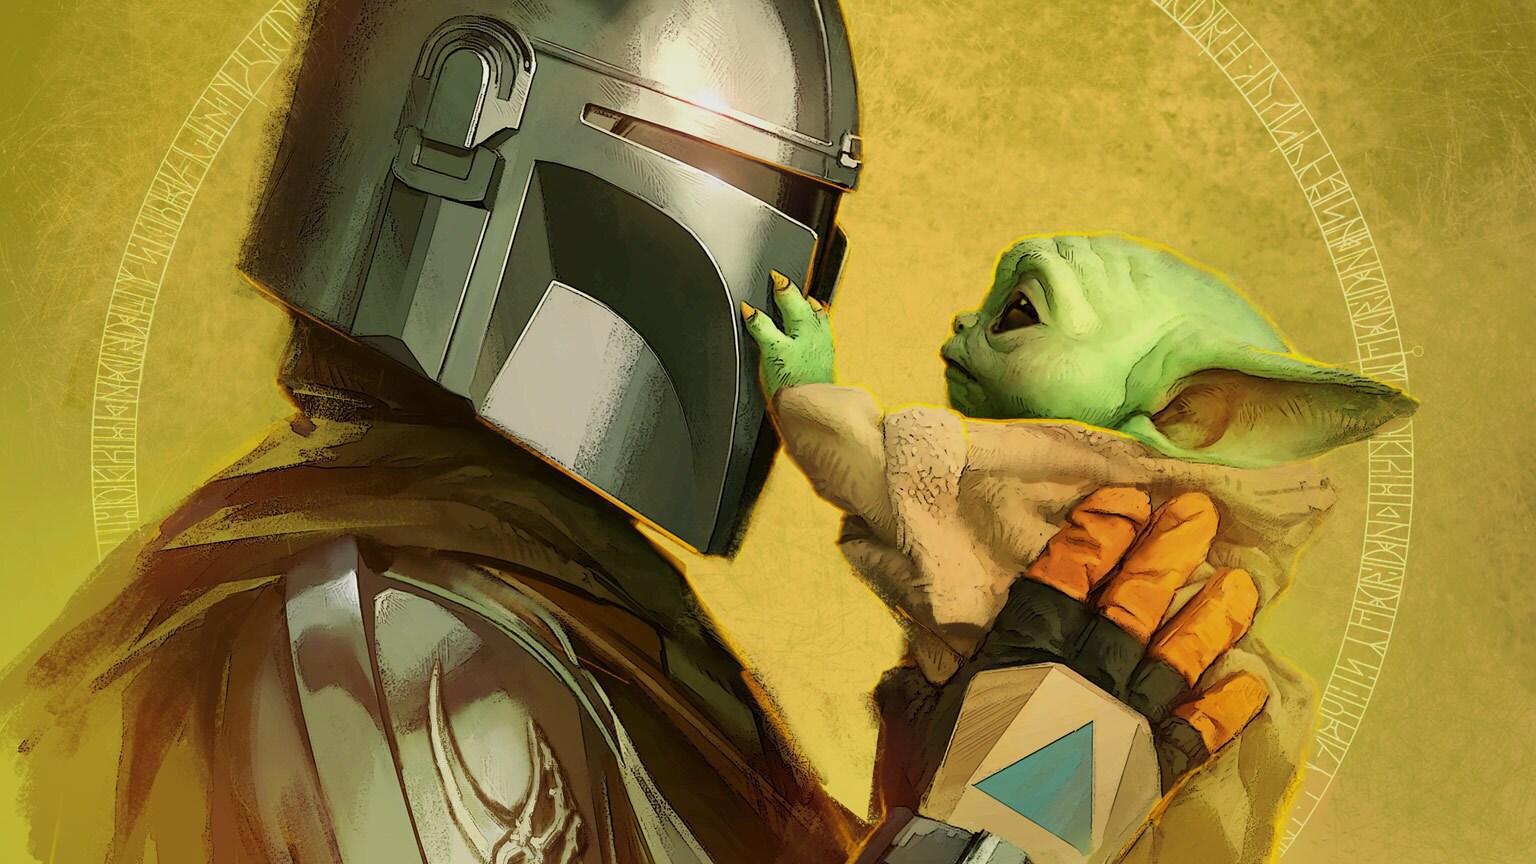 The Art of Star Wars: The Mandalorian Season 2 Coming This December